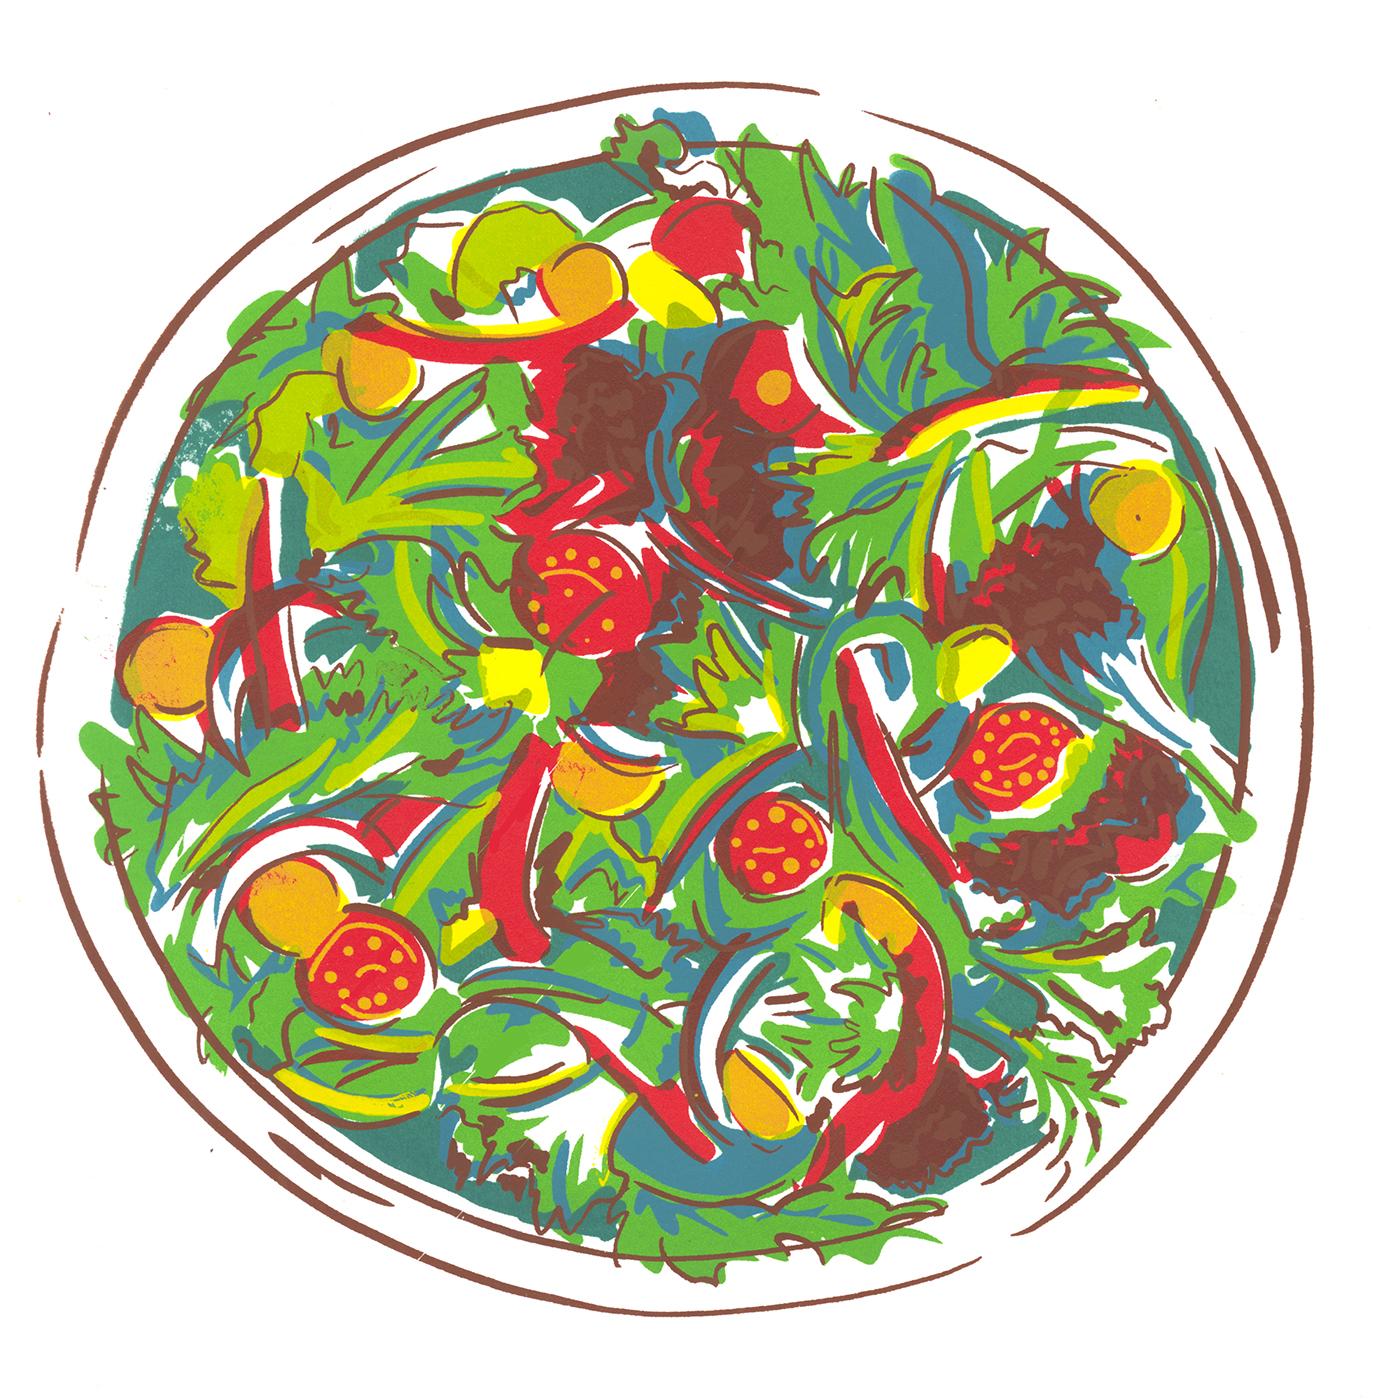 Screenprinting screenprint printmaking ramen Cereal salad Food  bowls food illustration